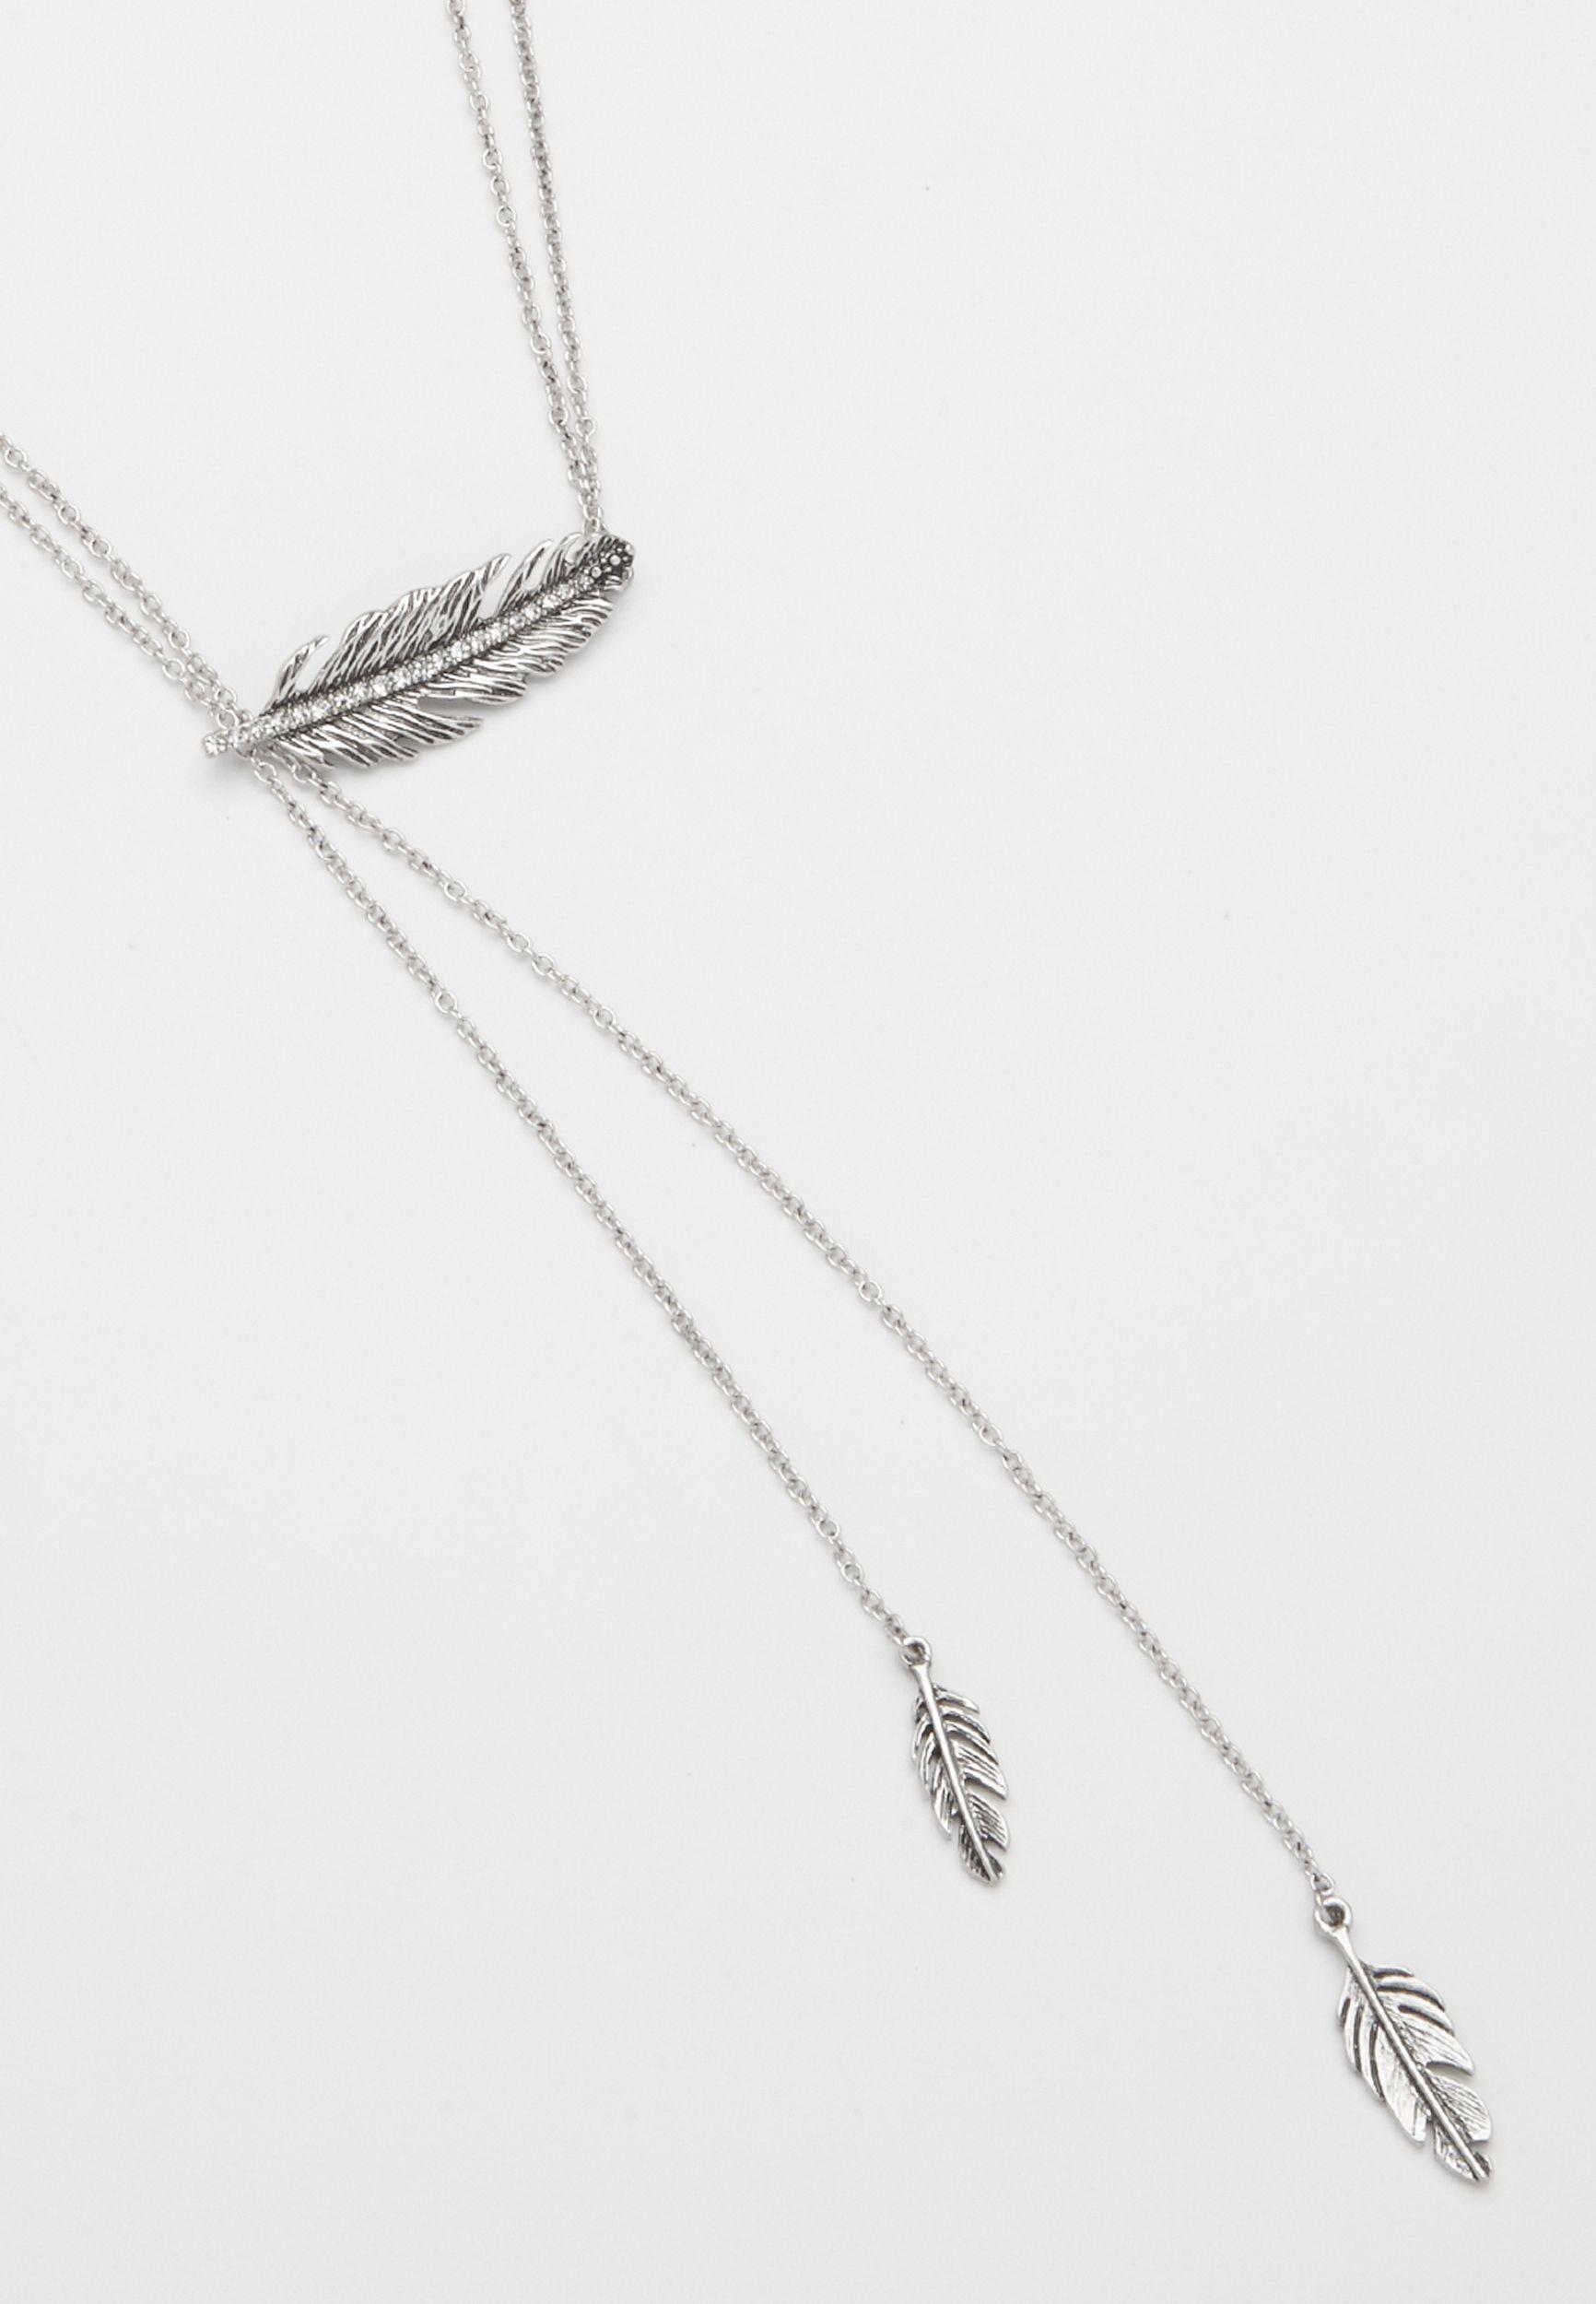 Maurices Rhinestone Feather Pendant Necklace vGU0qa1Ko